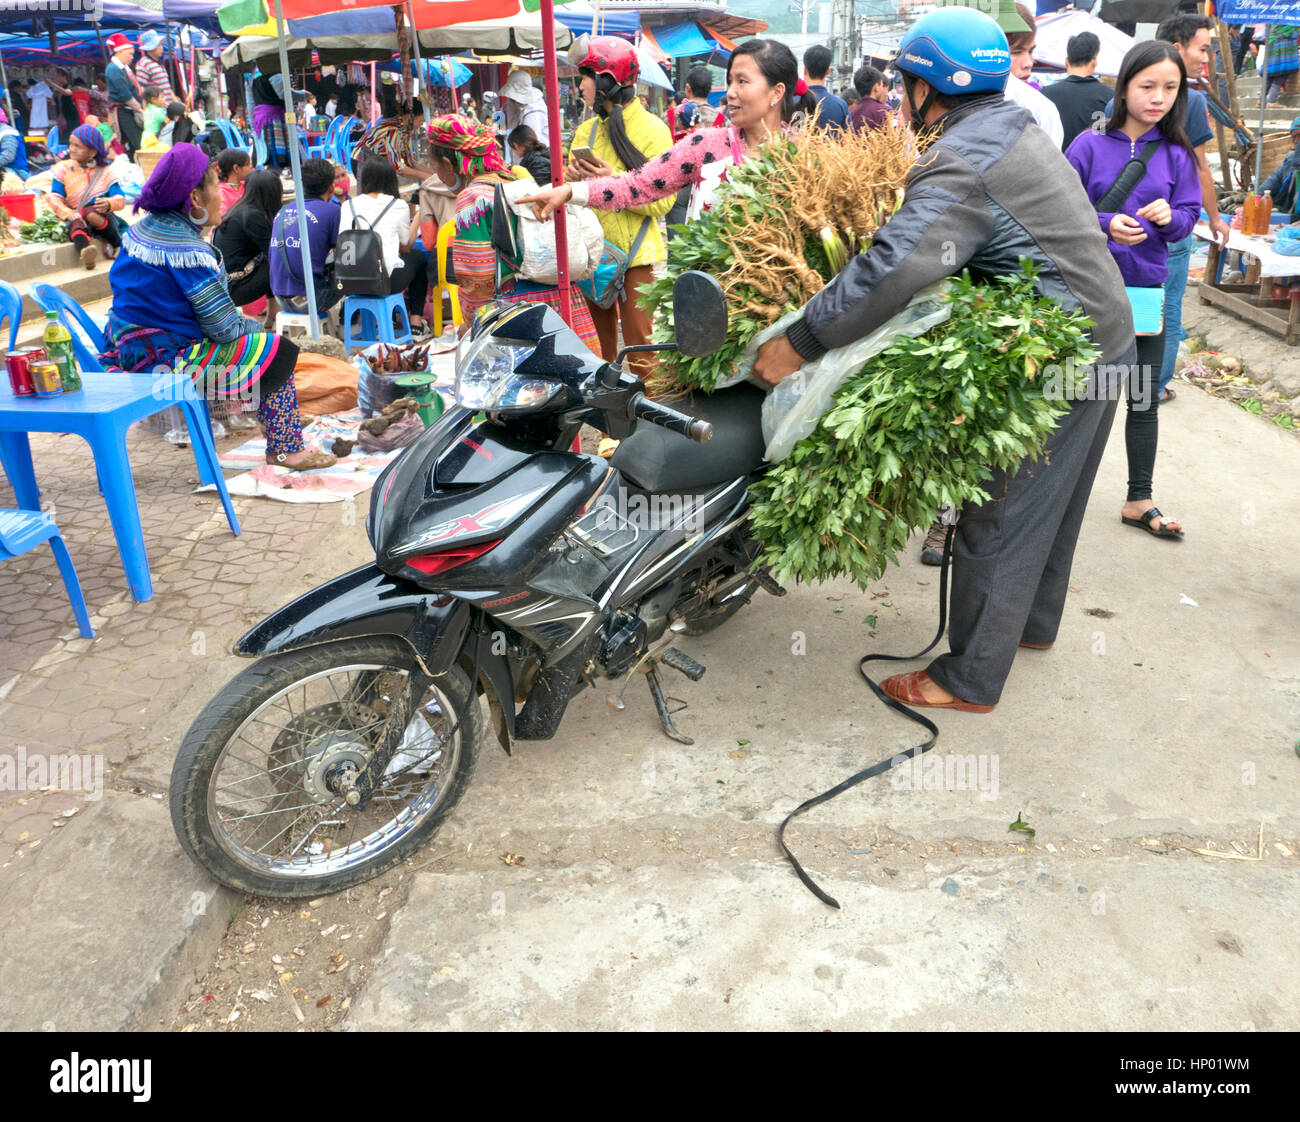 Motorradfahrer entladen geernteten Sellerie in Bac Ha Farmers Market, Motorrad, Mode Of Transportation, Bac Ha. Stockbild